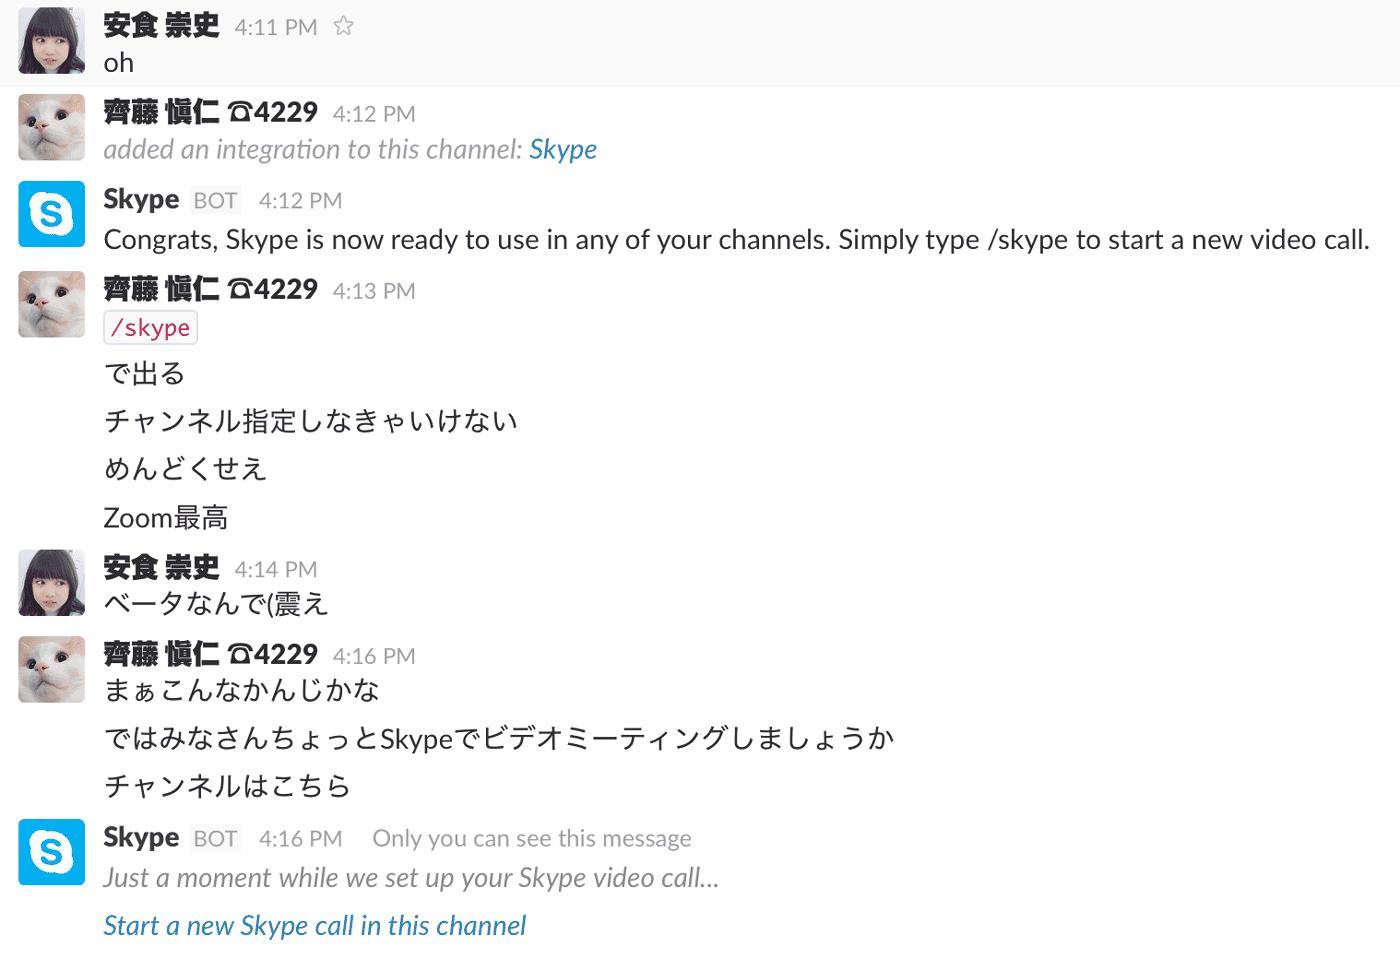 slack-skype001